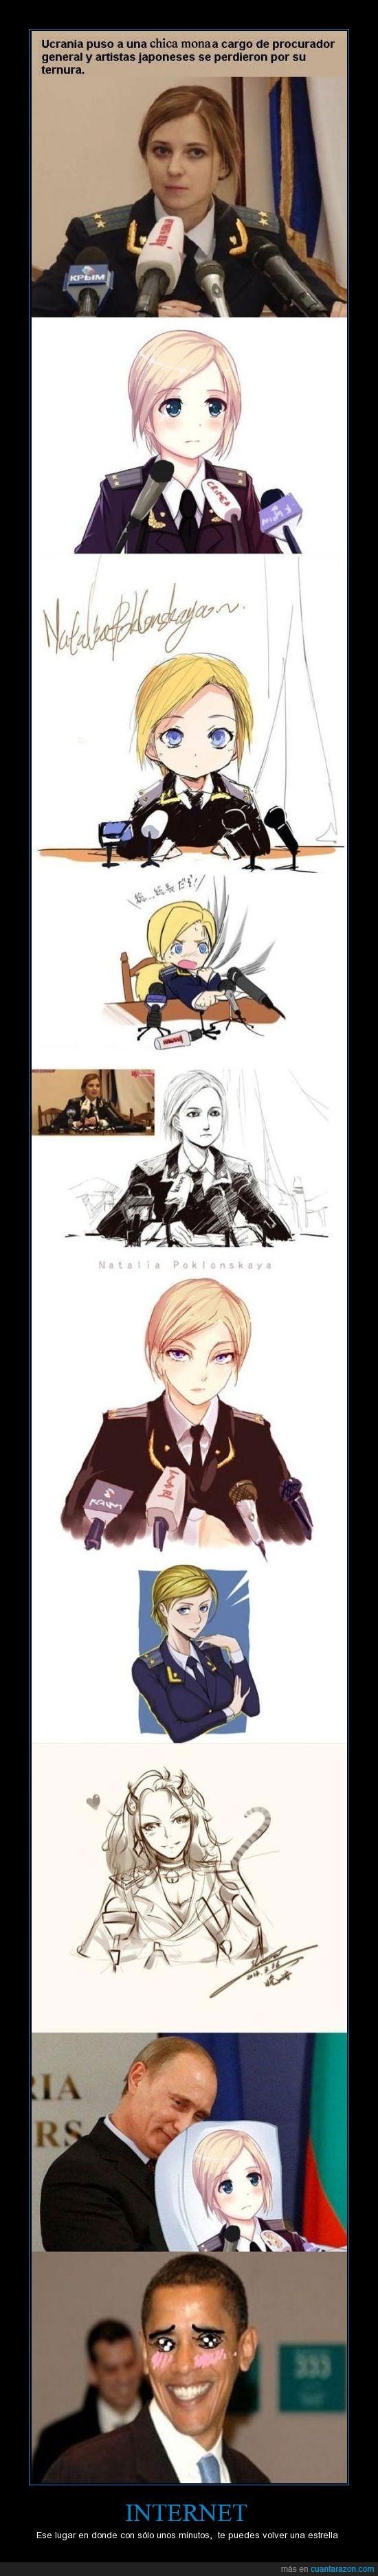 anime,chica,internet,japoneses,linda,manga,obama,putin,ternura,ucrania